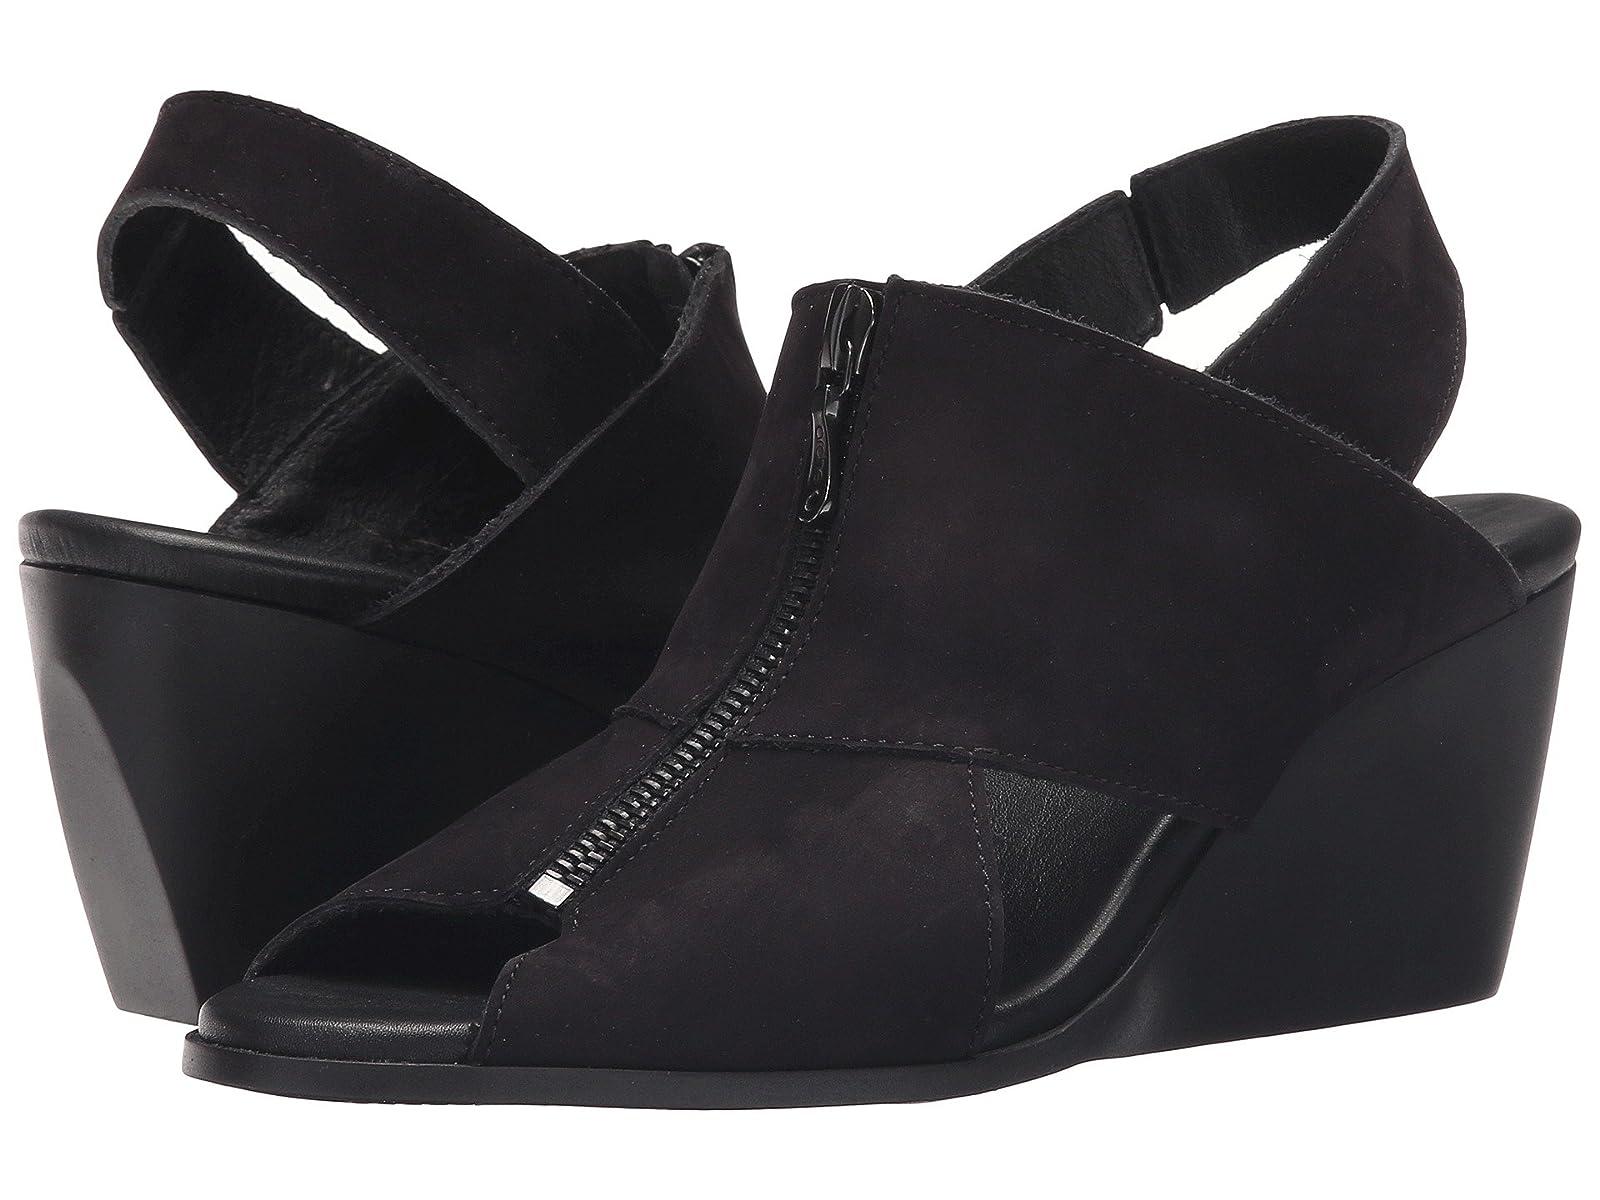 Arche EgwalCheap and distinctive eye-catching shoes